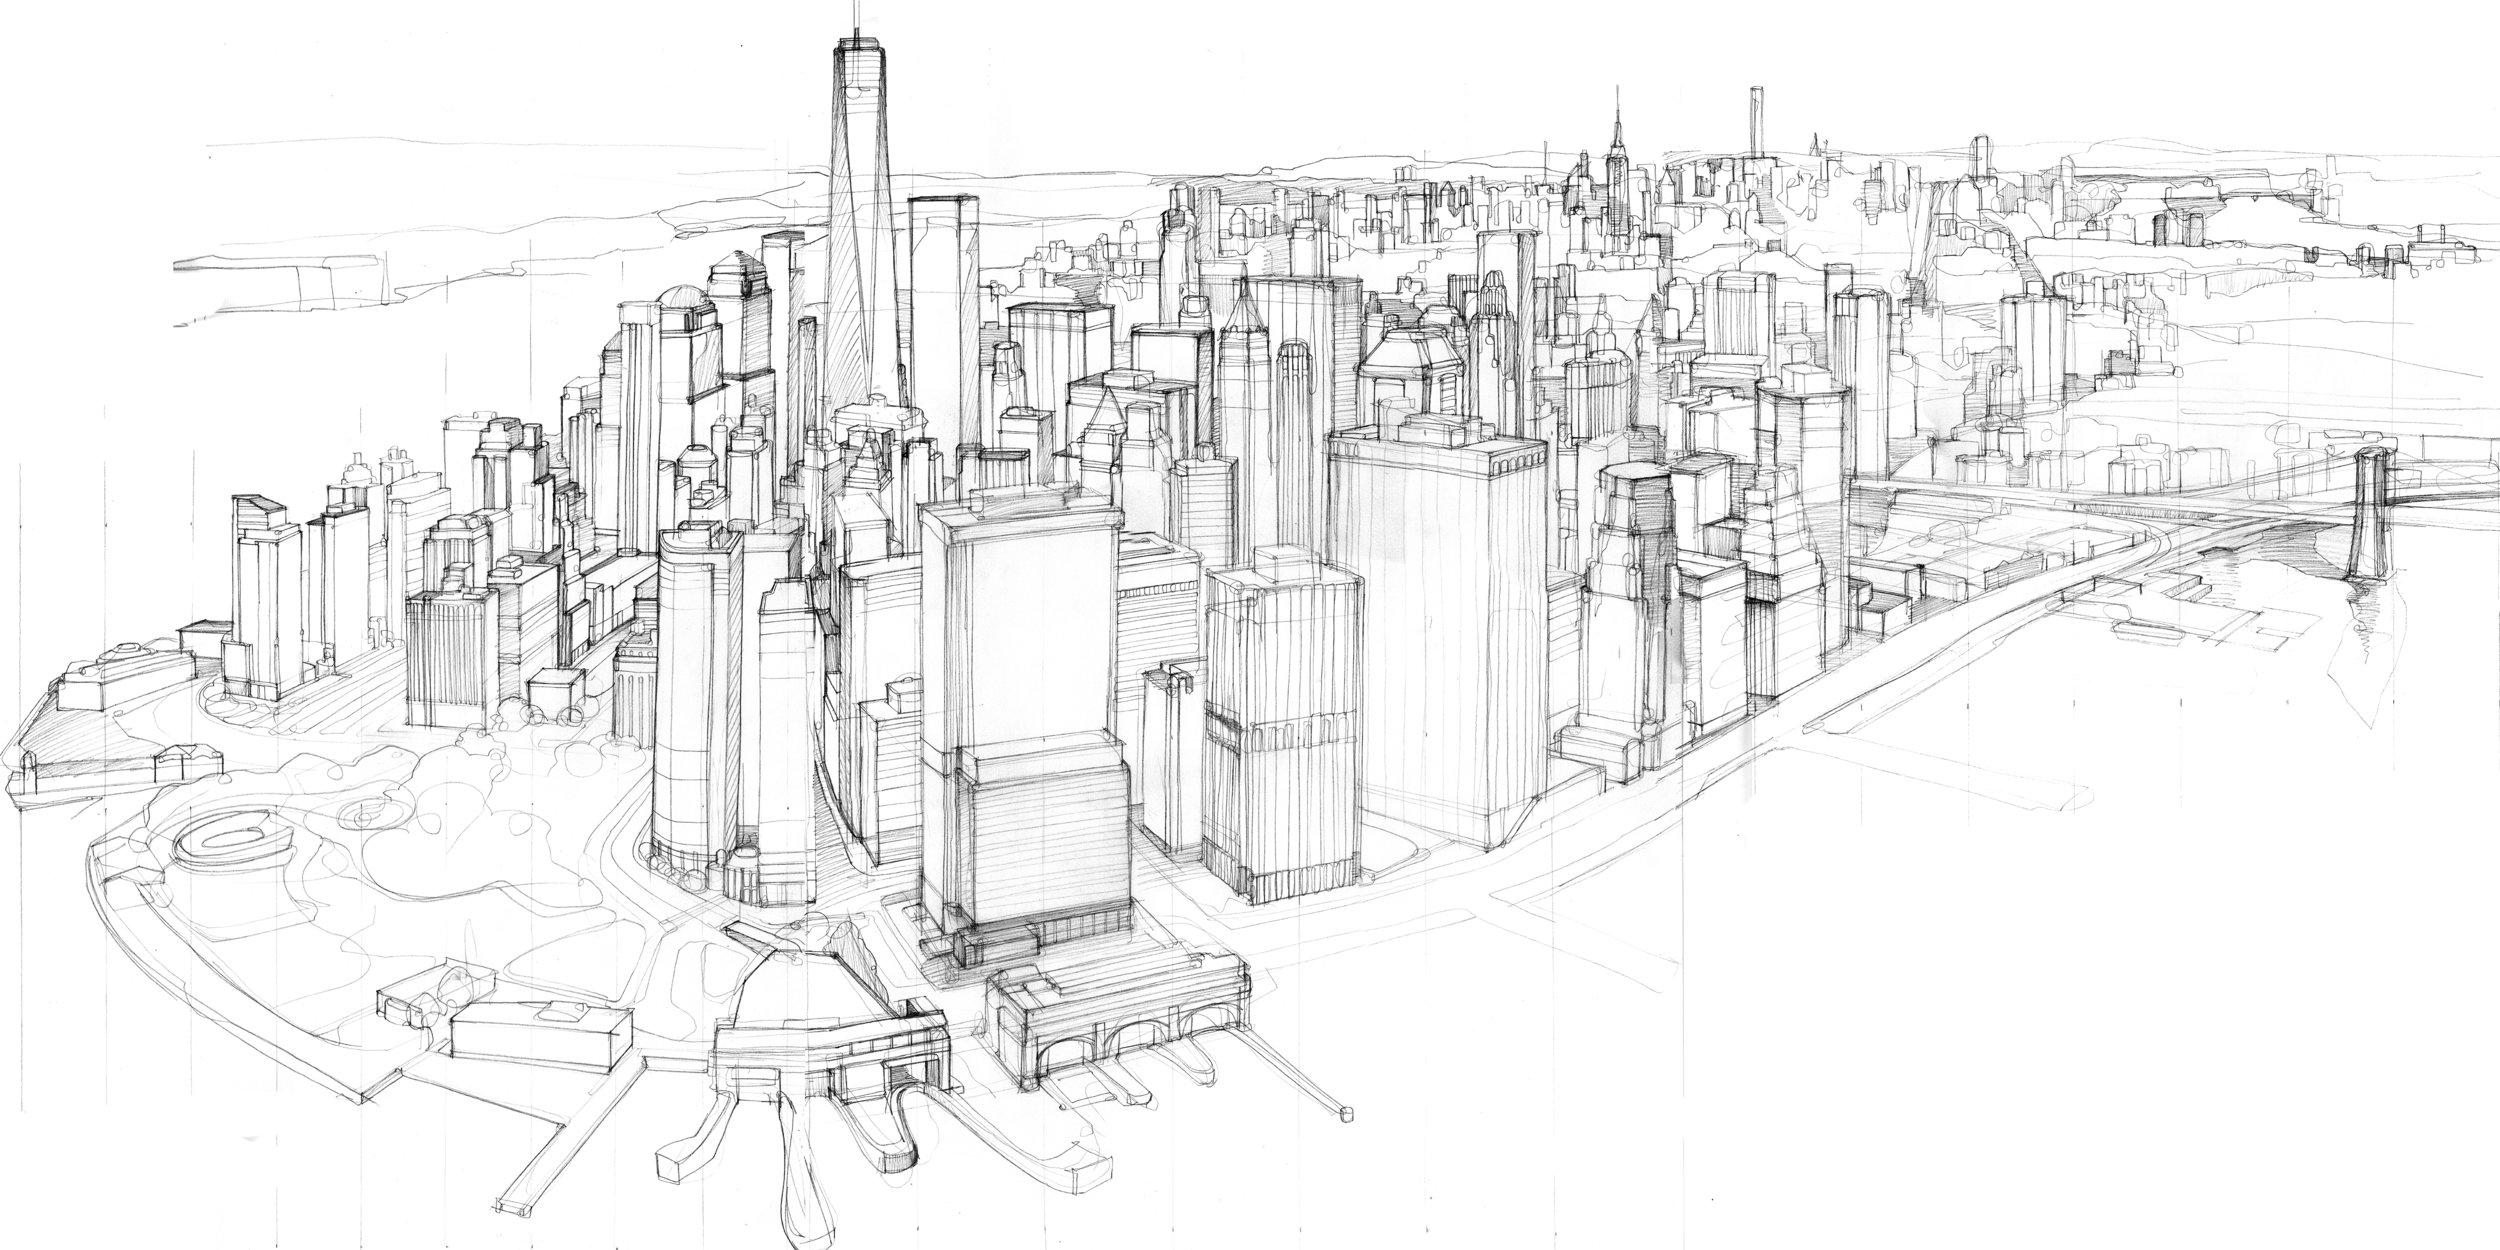 nyc sketch.jpg